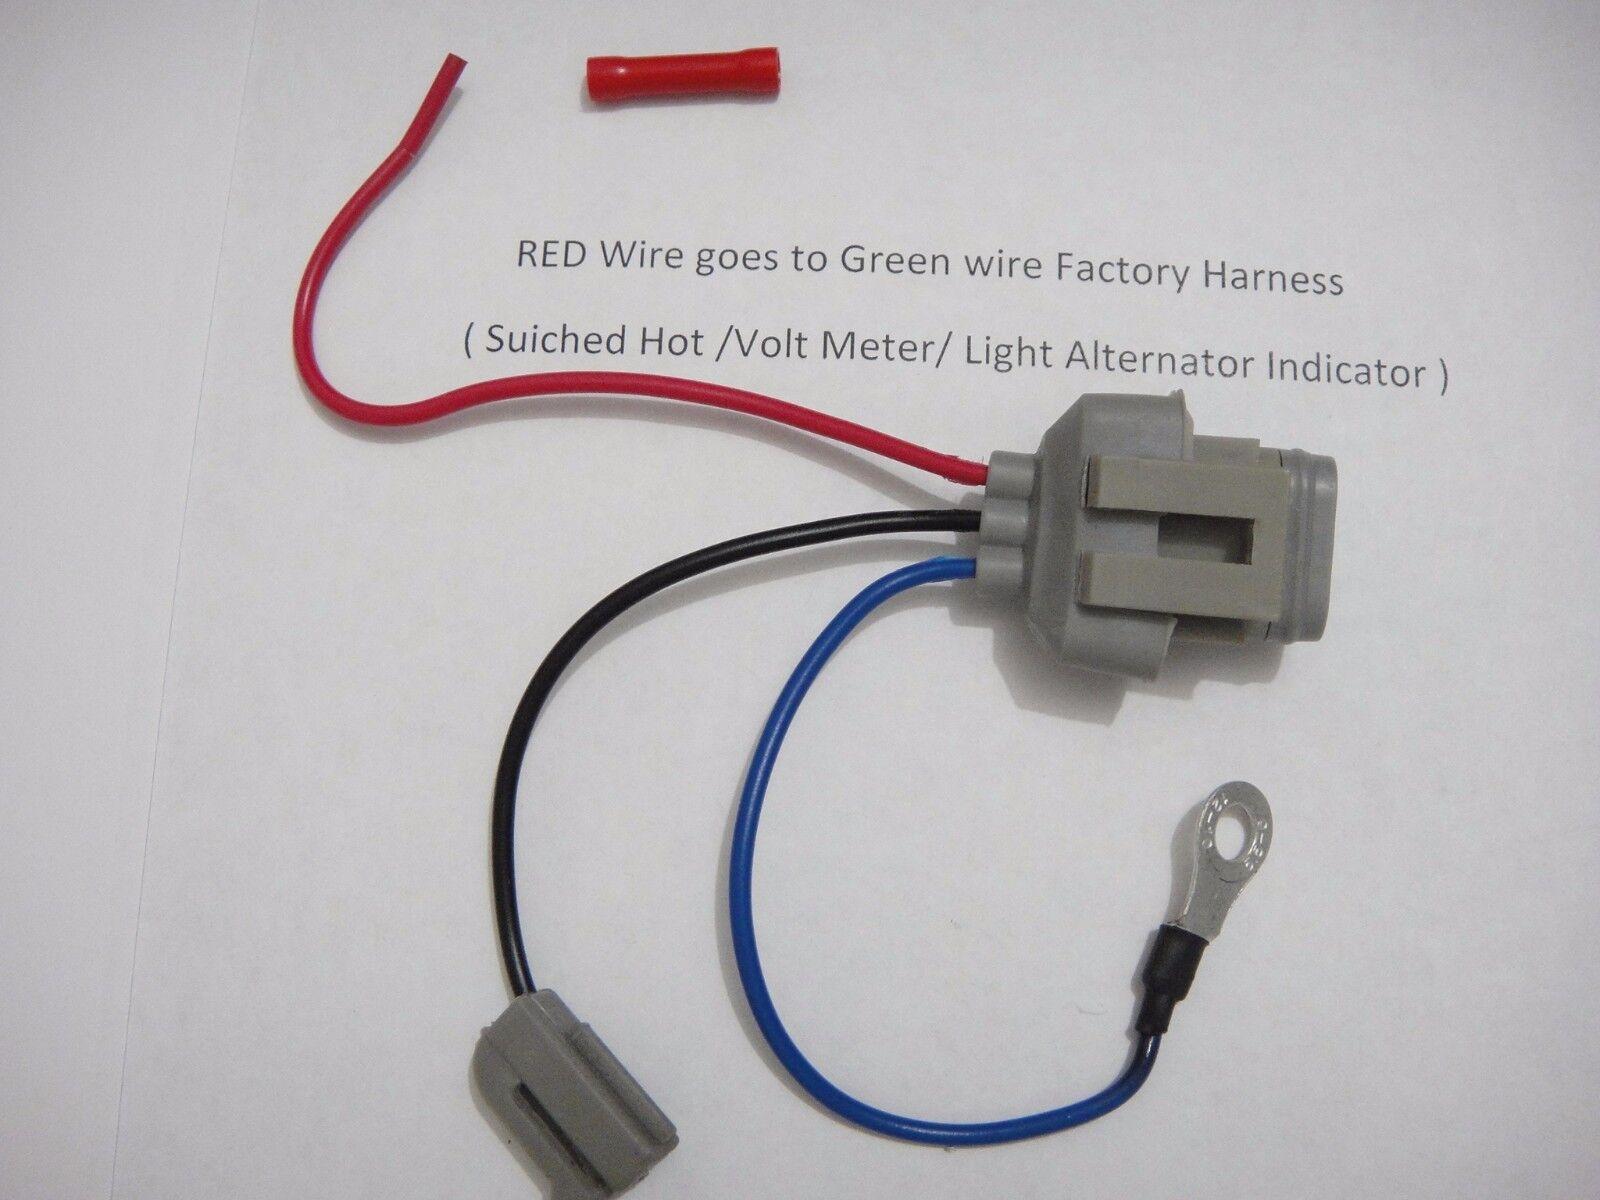 Ford Alternator Conversion Harness Wiring Diagram Will Be A Thing 3g Connector 1 Wire Rh Ebayshopkorea Com